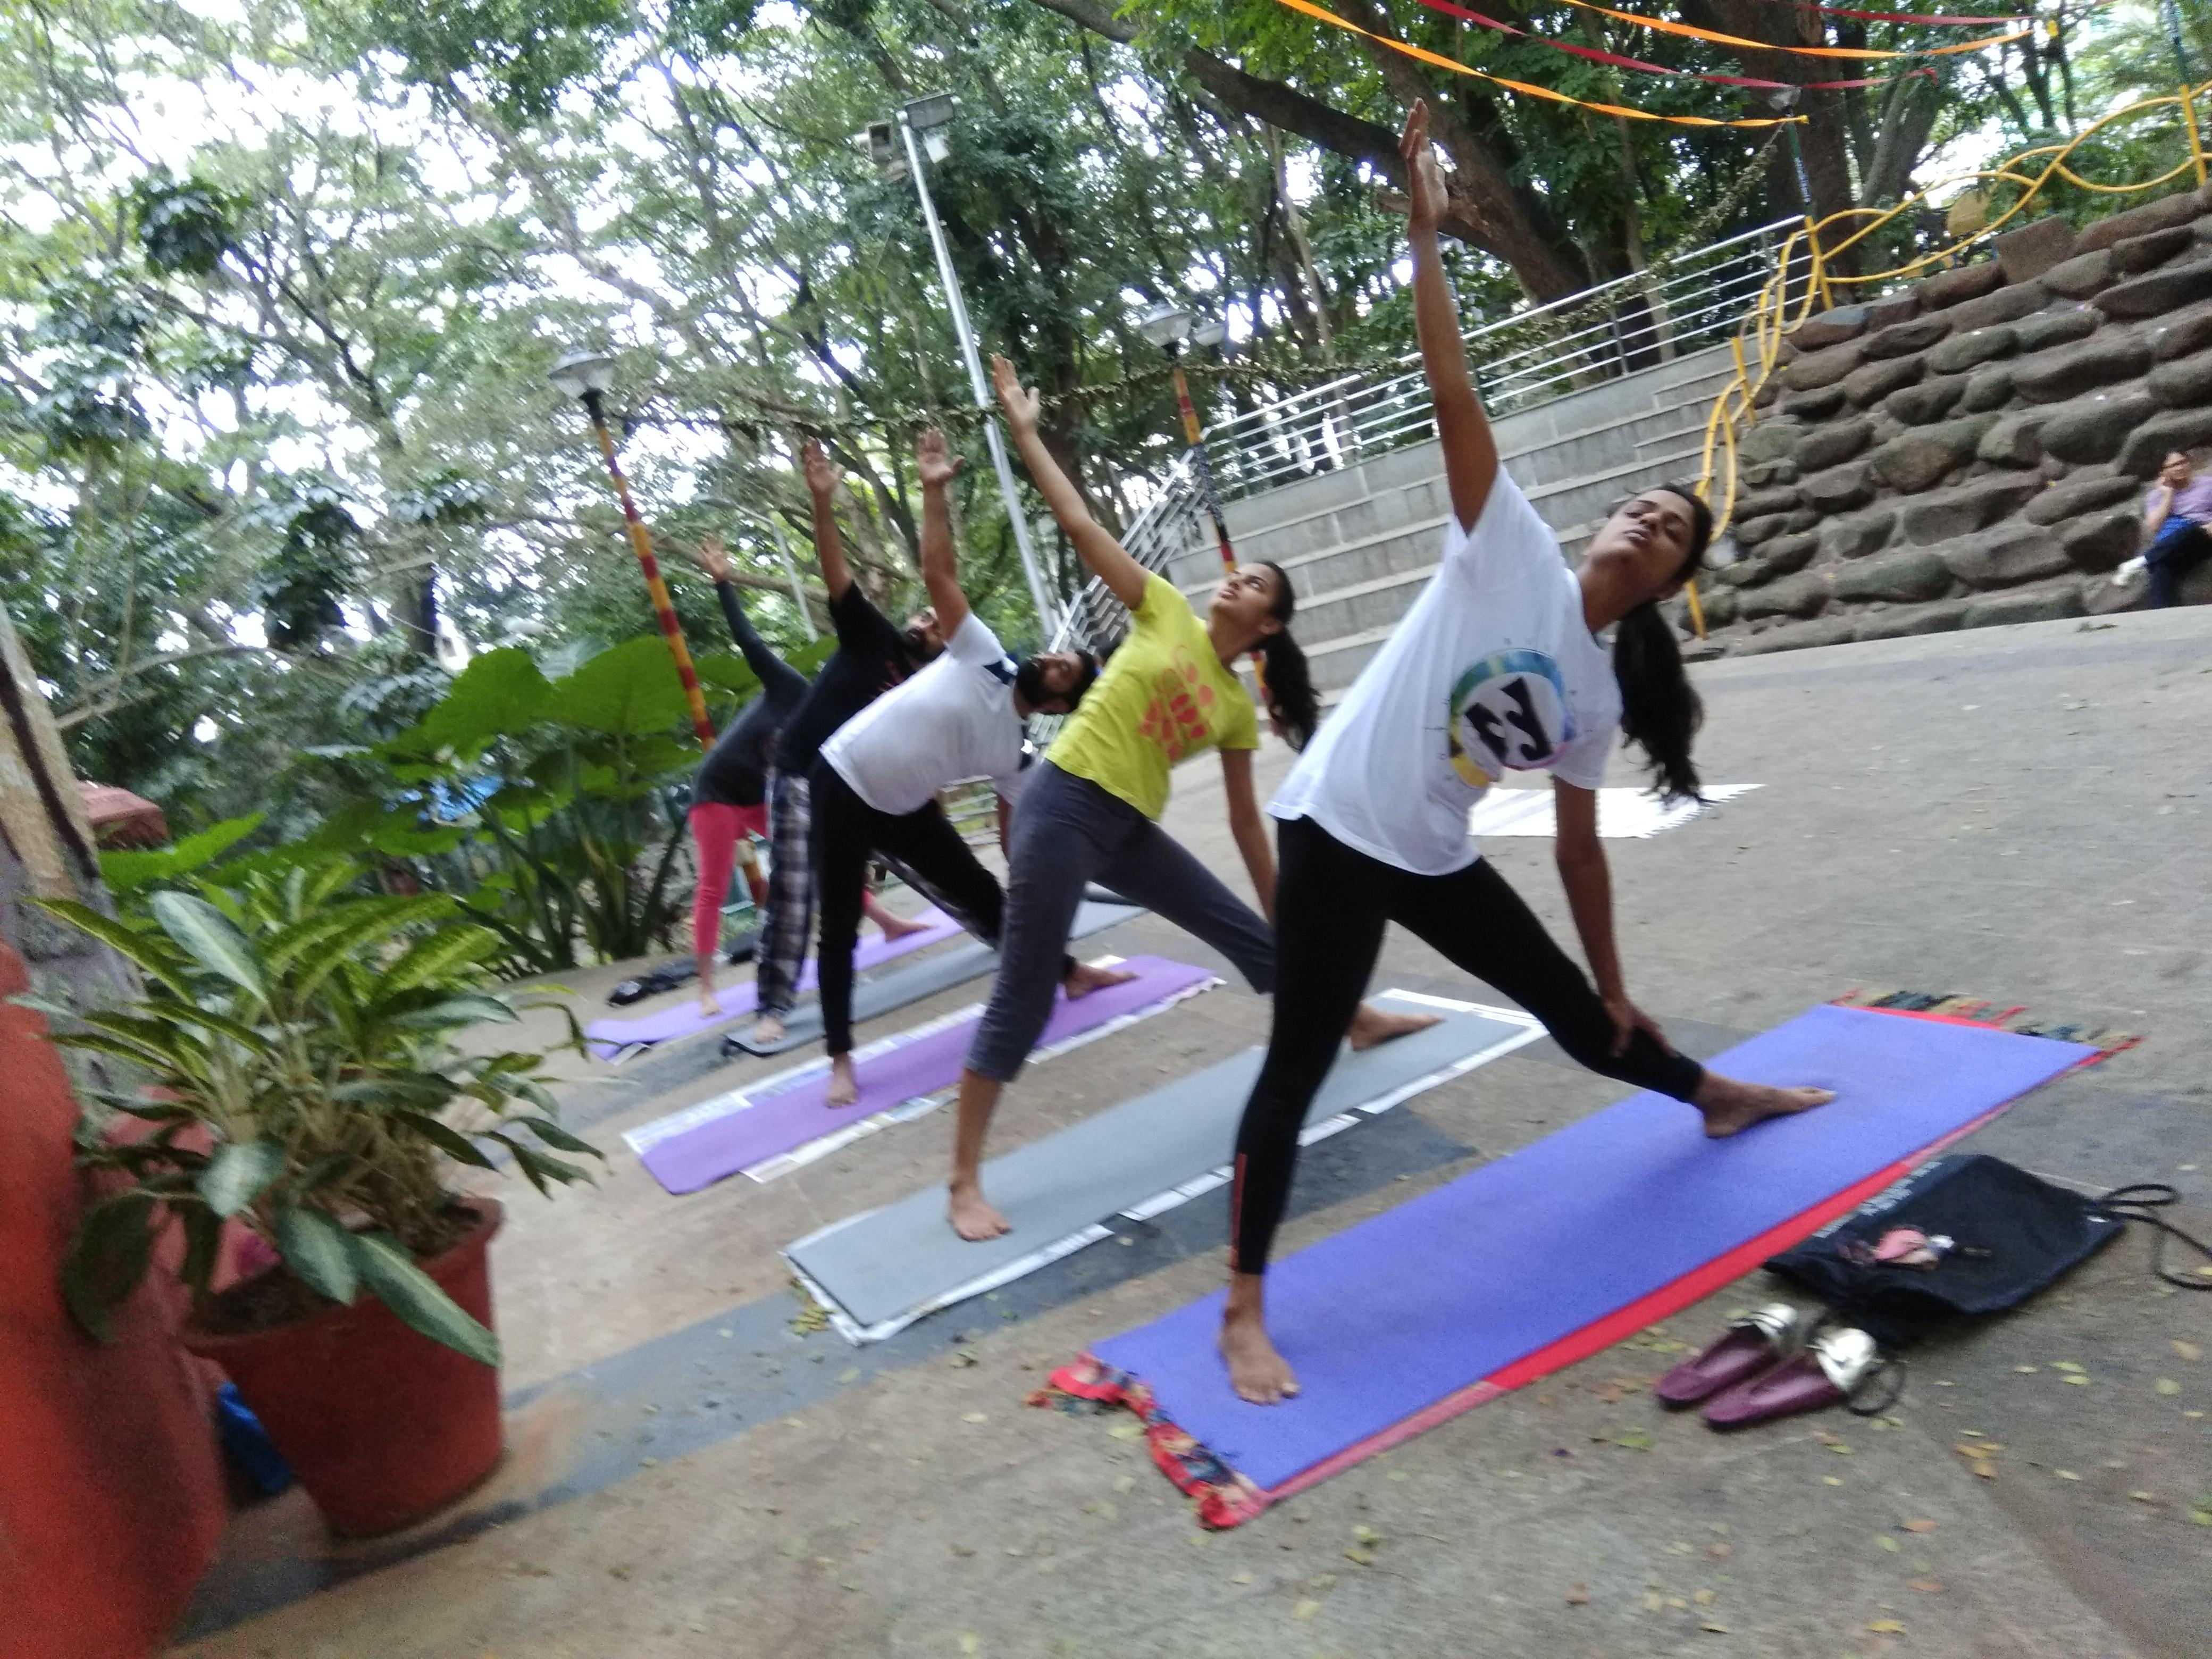 Yoga should not be an option, but a discipline.